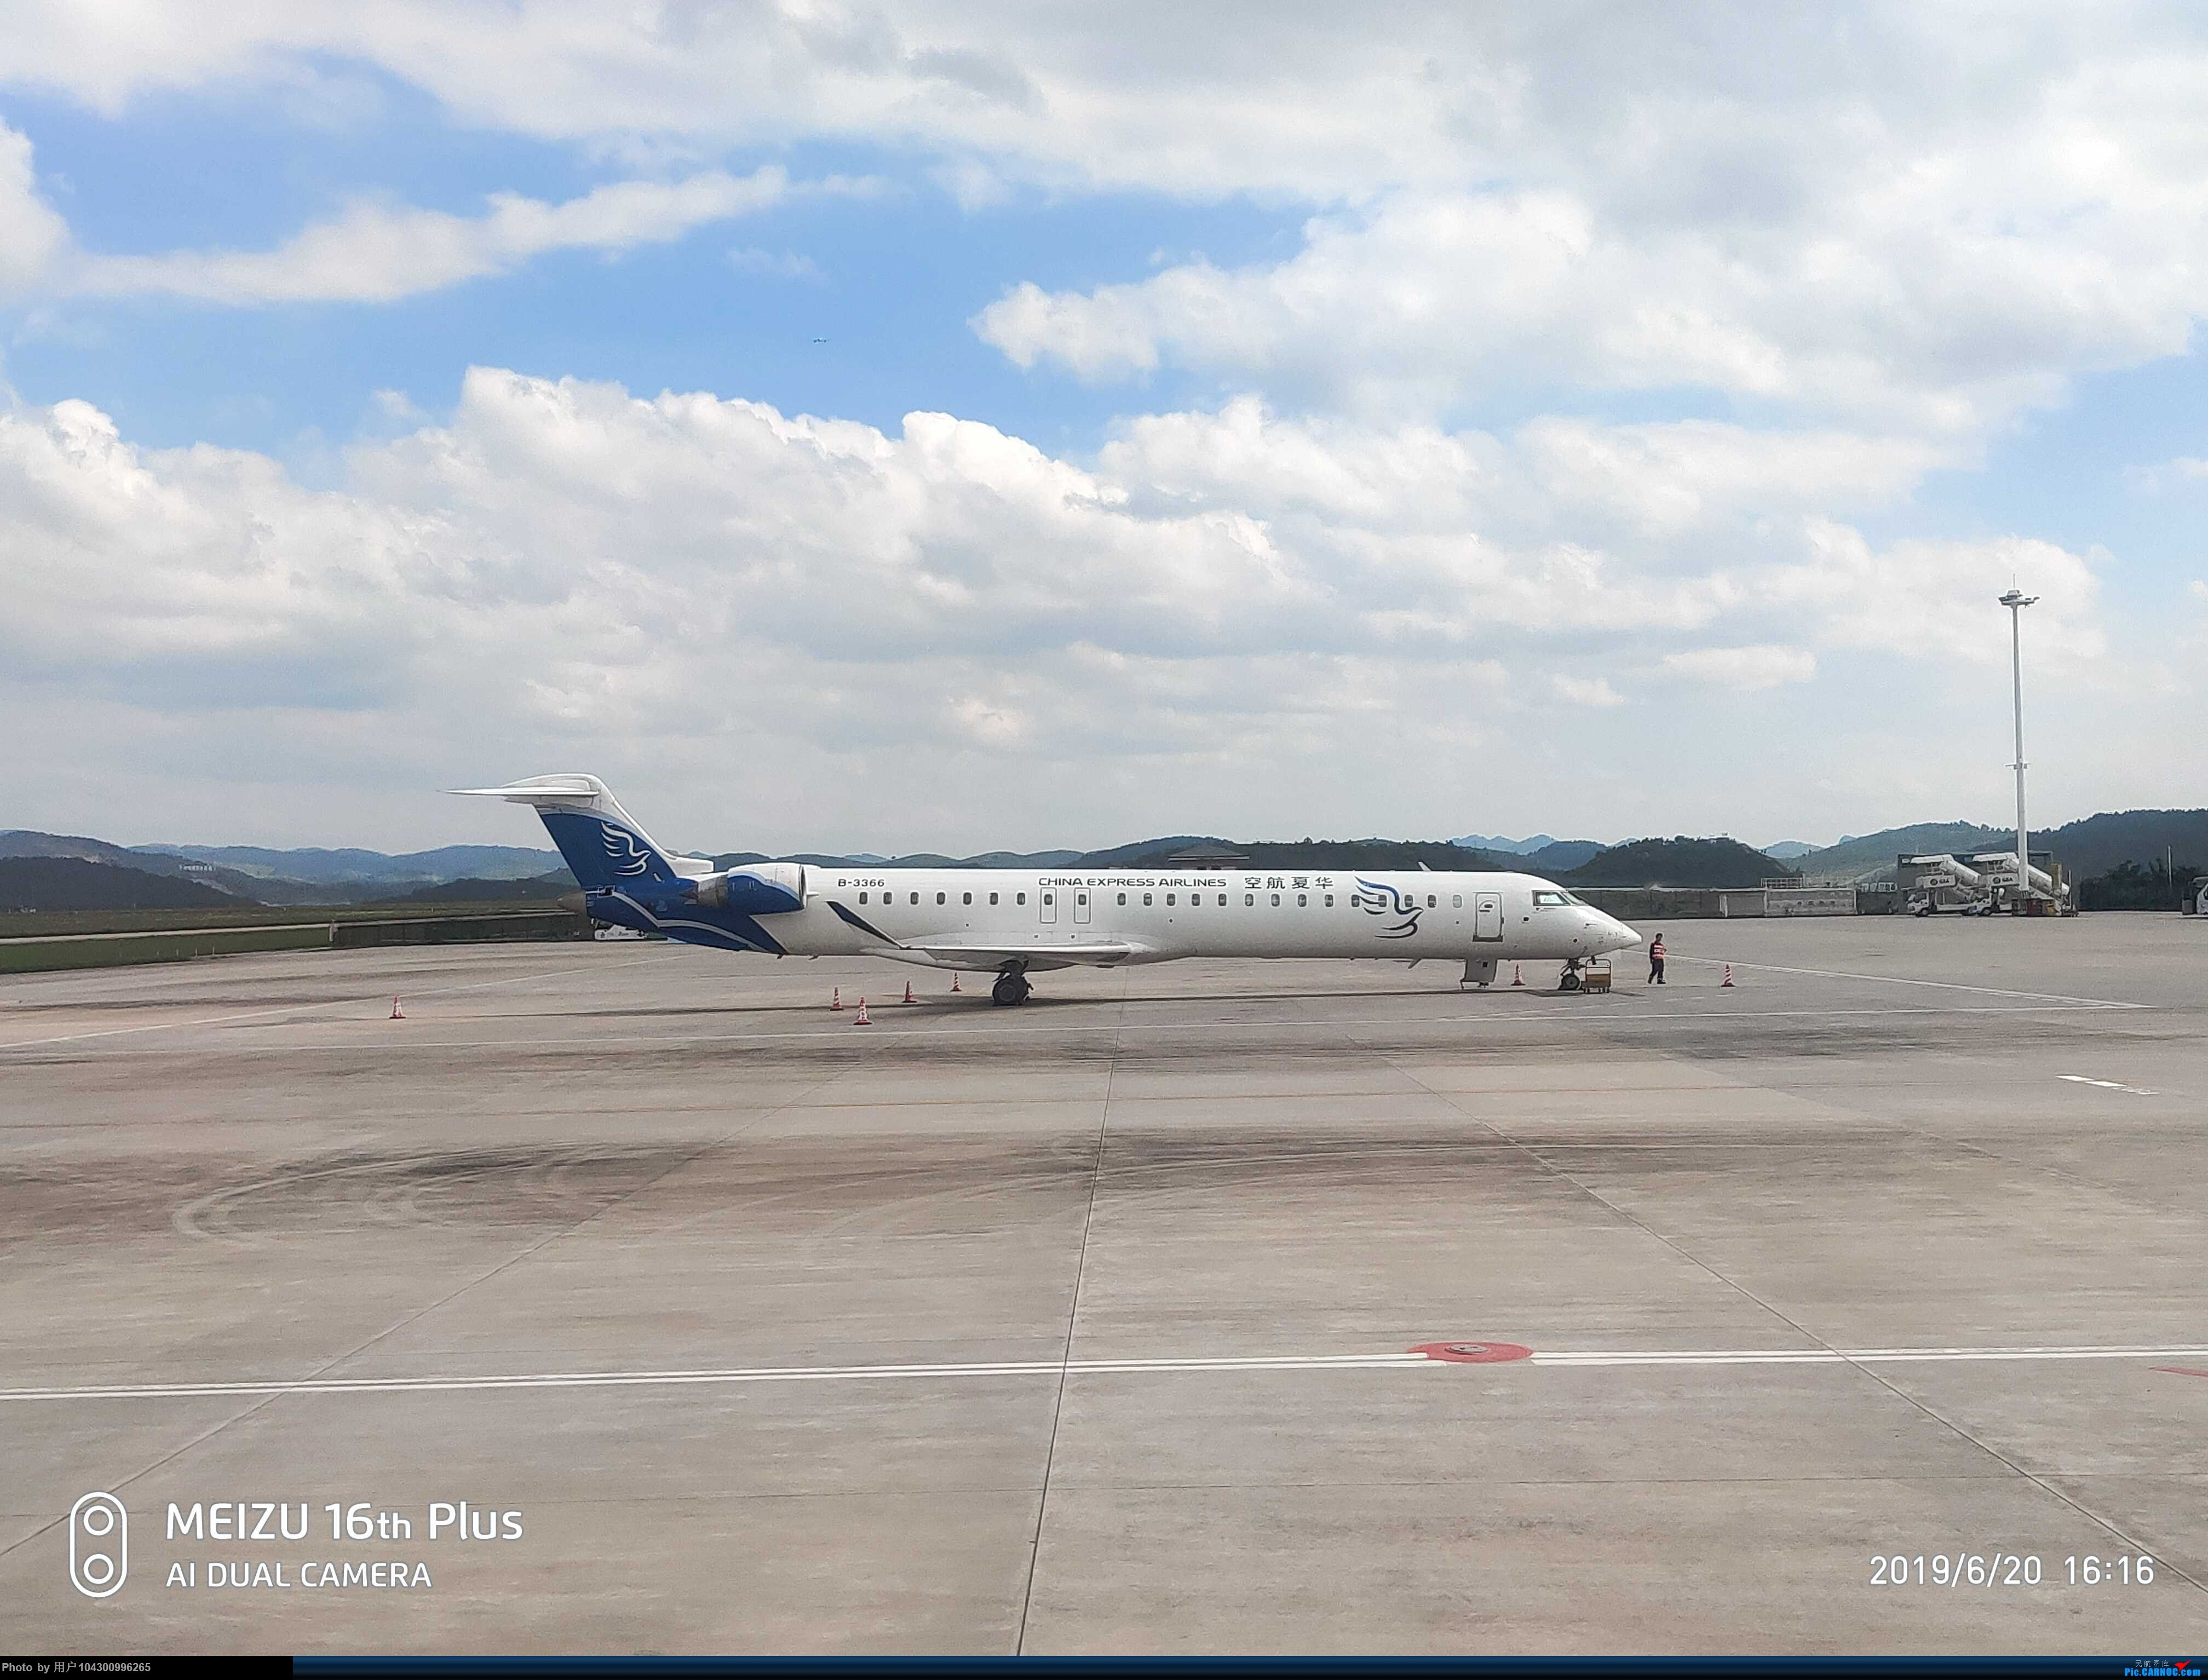 Re:[原创]DM哥飞行游记--贵阳往返荔波2日游 BOMBARDIER CRJ900NG B-3366 中国贵阳龙洞堡国际机场